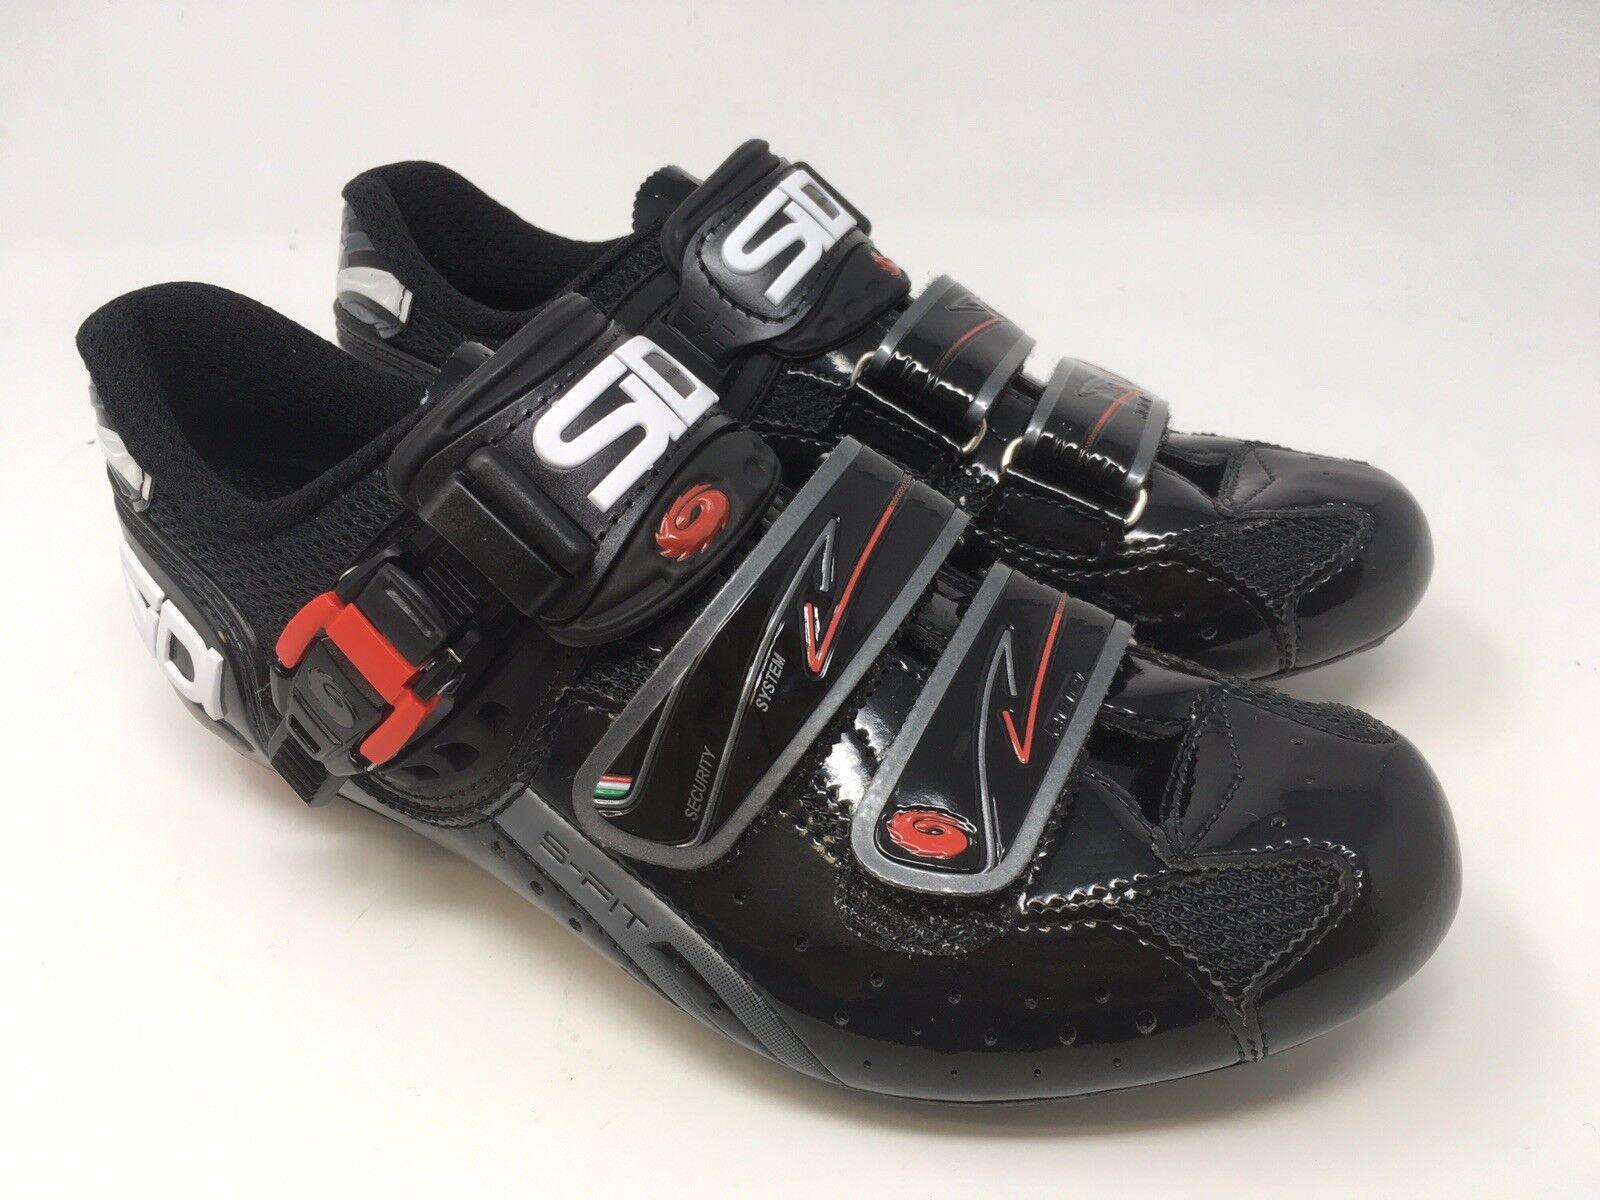 NEW SIDI Genius Women's Road Cycling Biking shoes VARIOUS SIZES NEW IN BOX